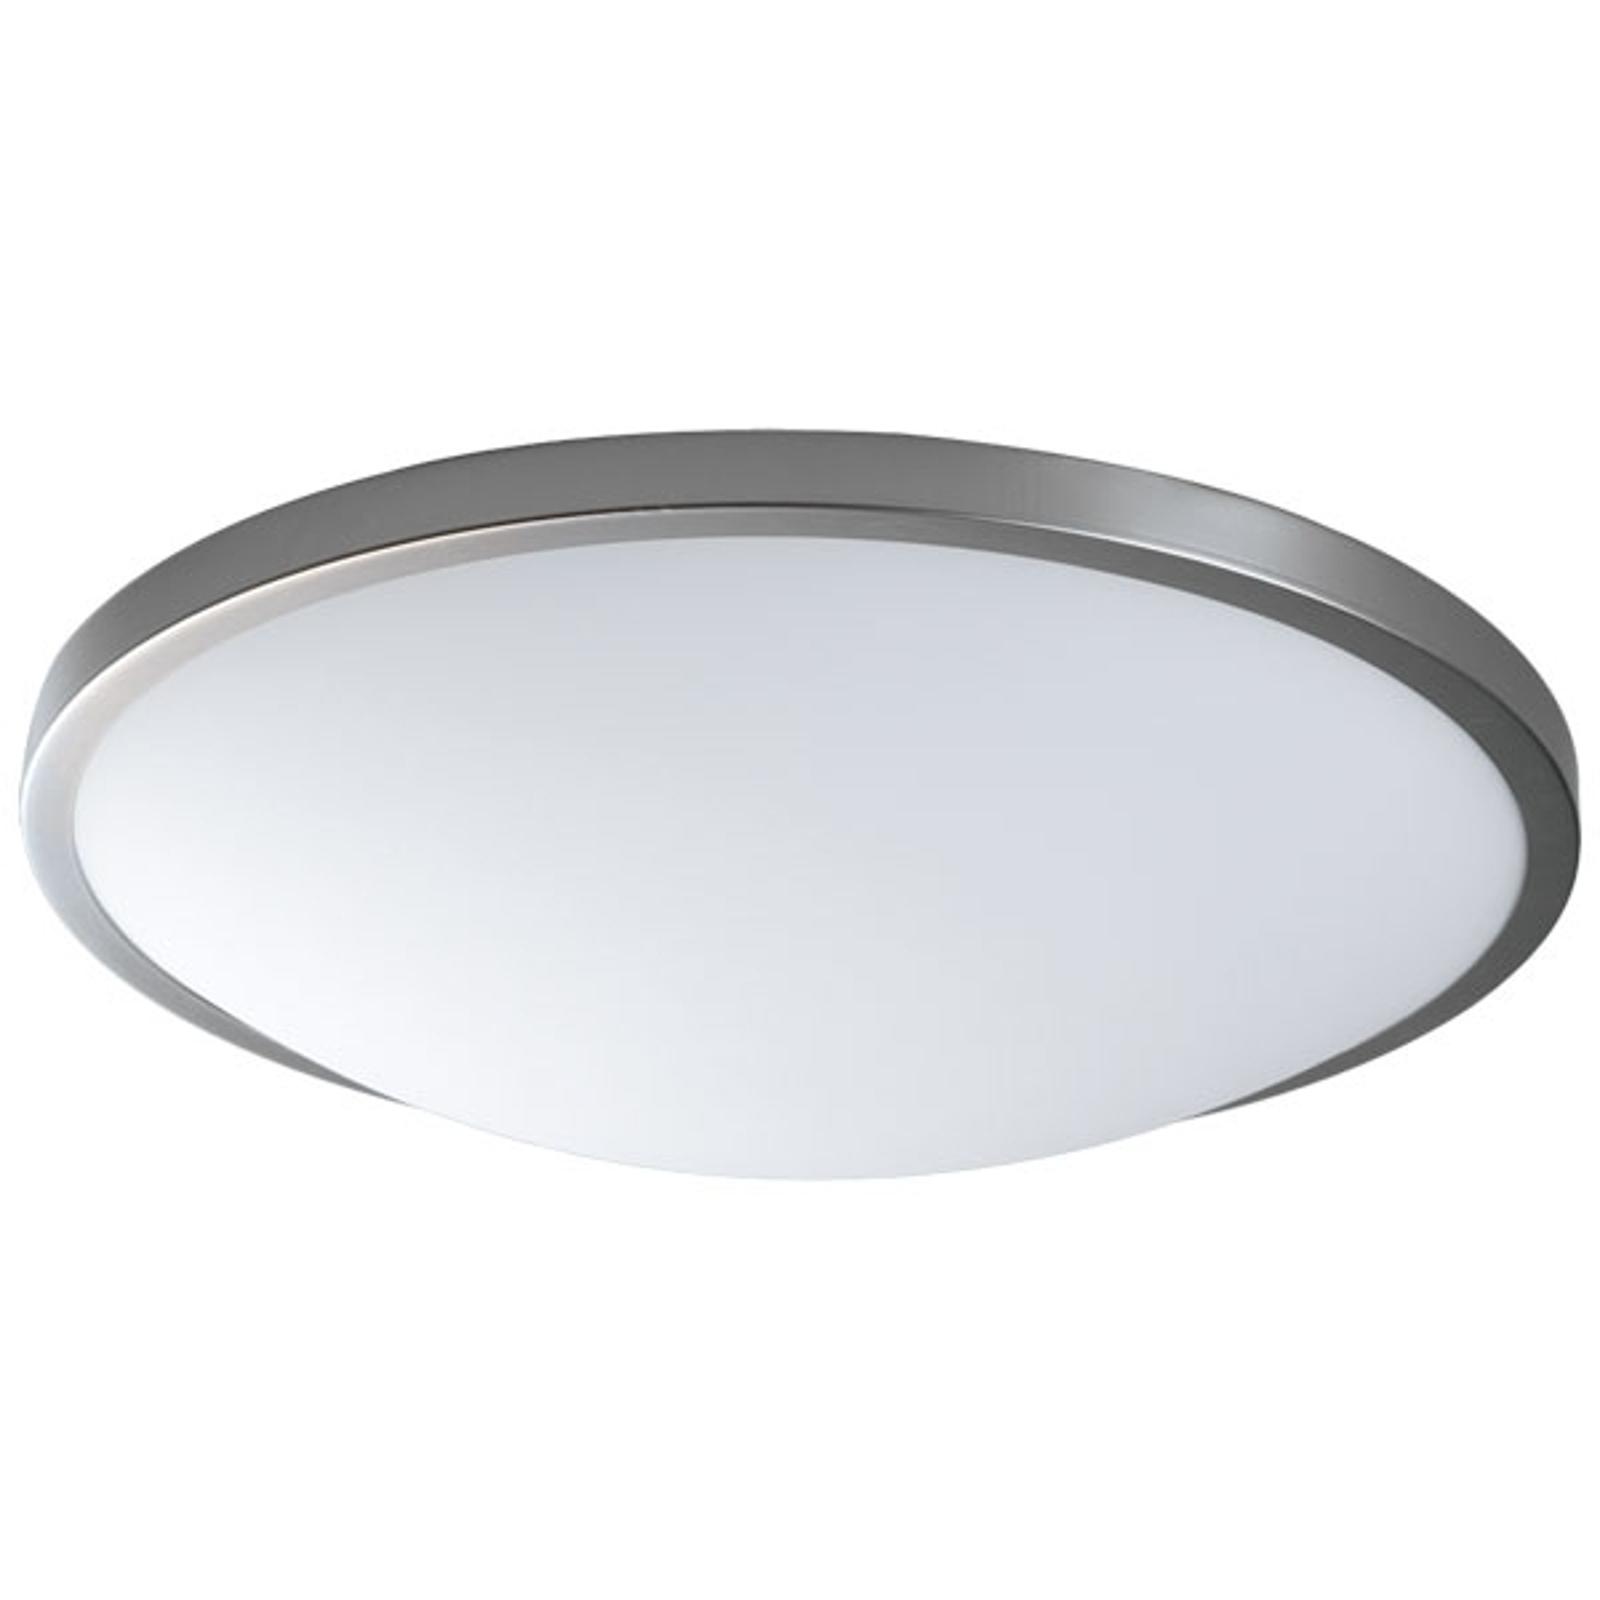 Lampa sufitowa Santos nikiel lub mat